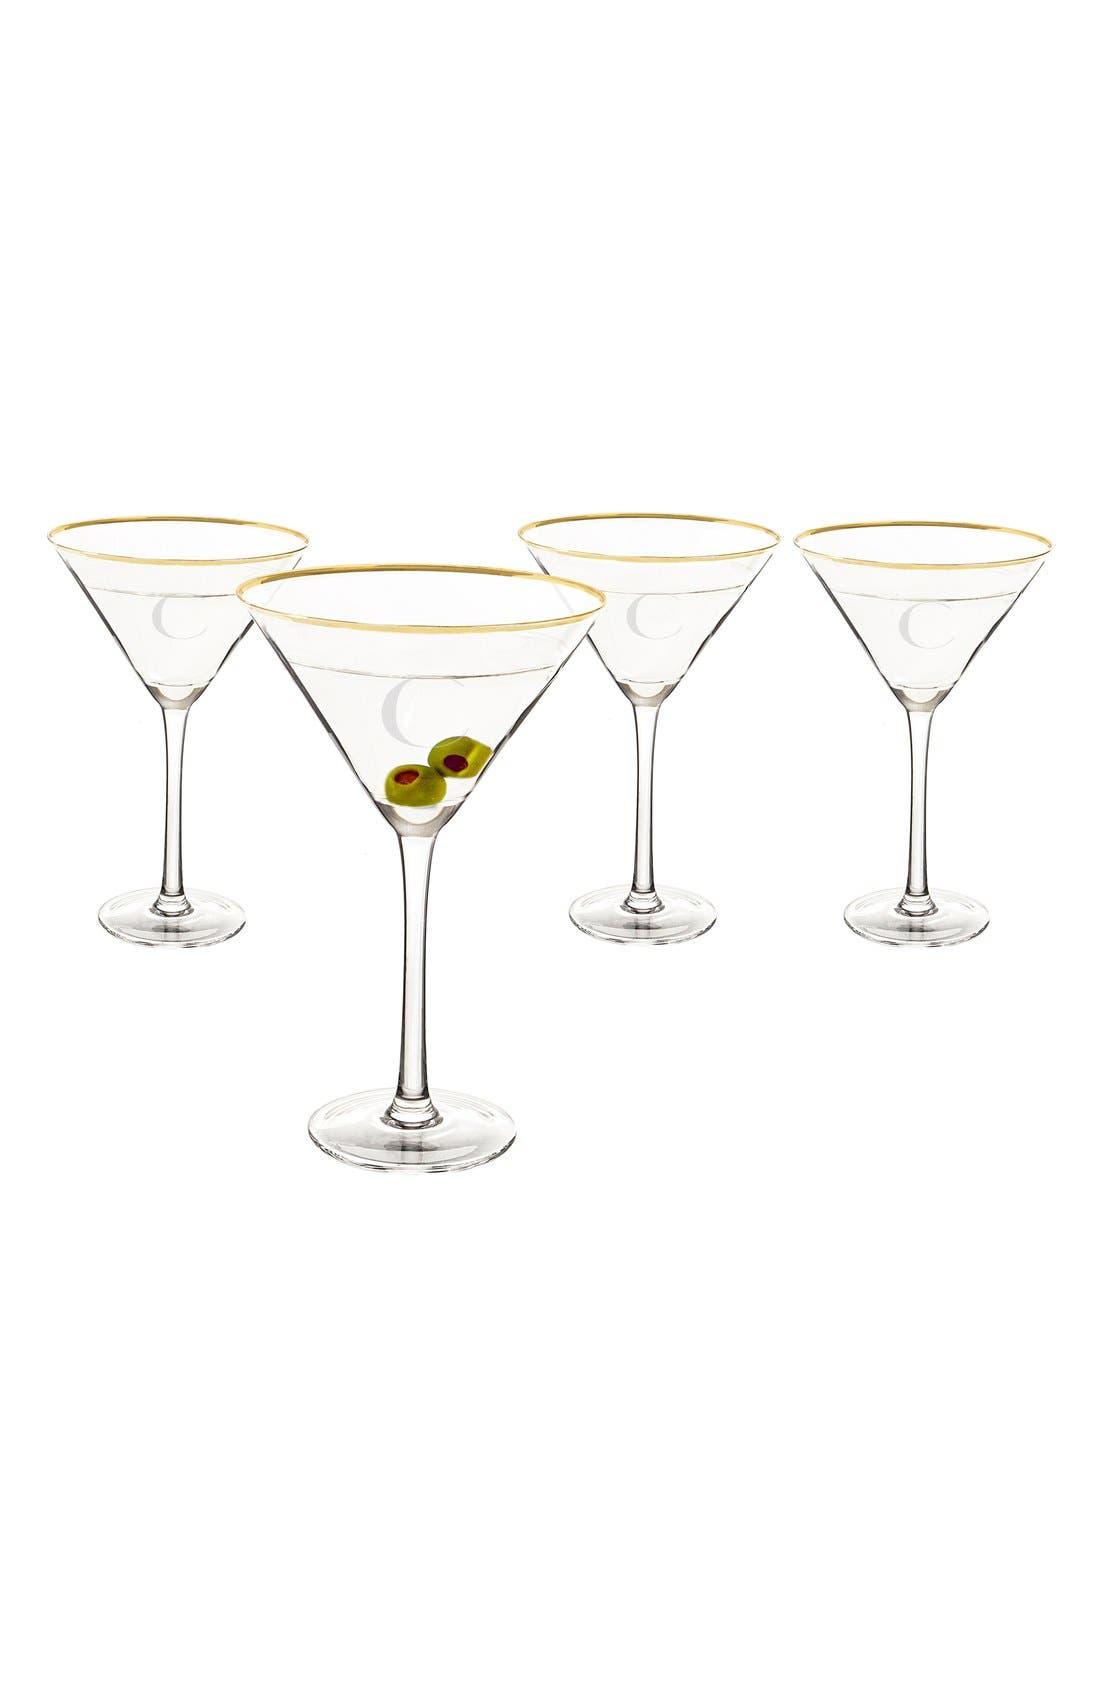 Set of 4 Gold Rimmed Monogram Martini Glasses,                         Main,                         color, C